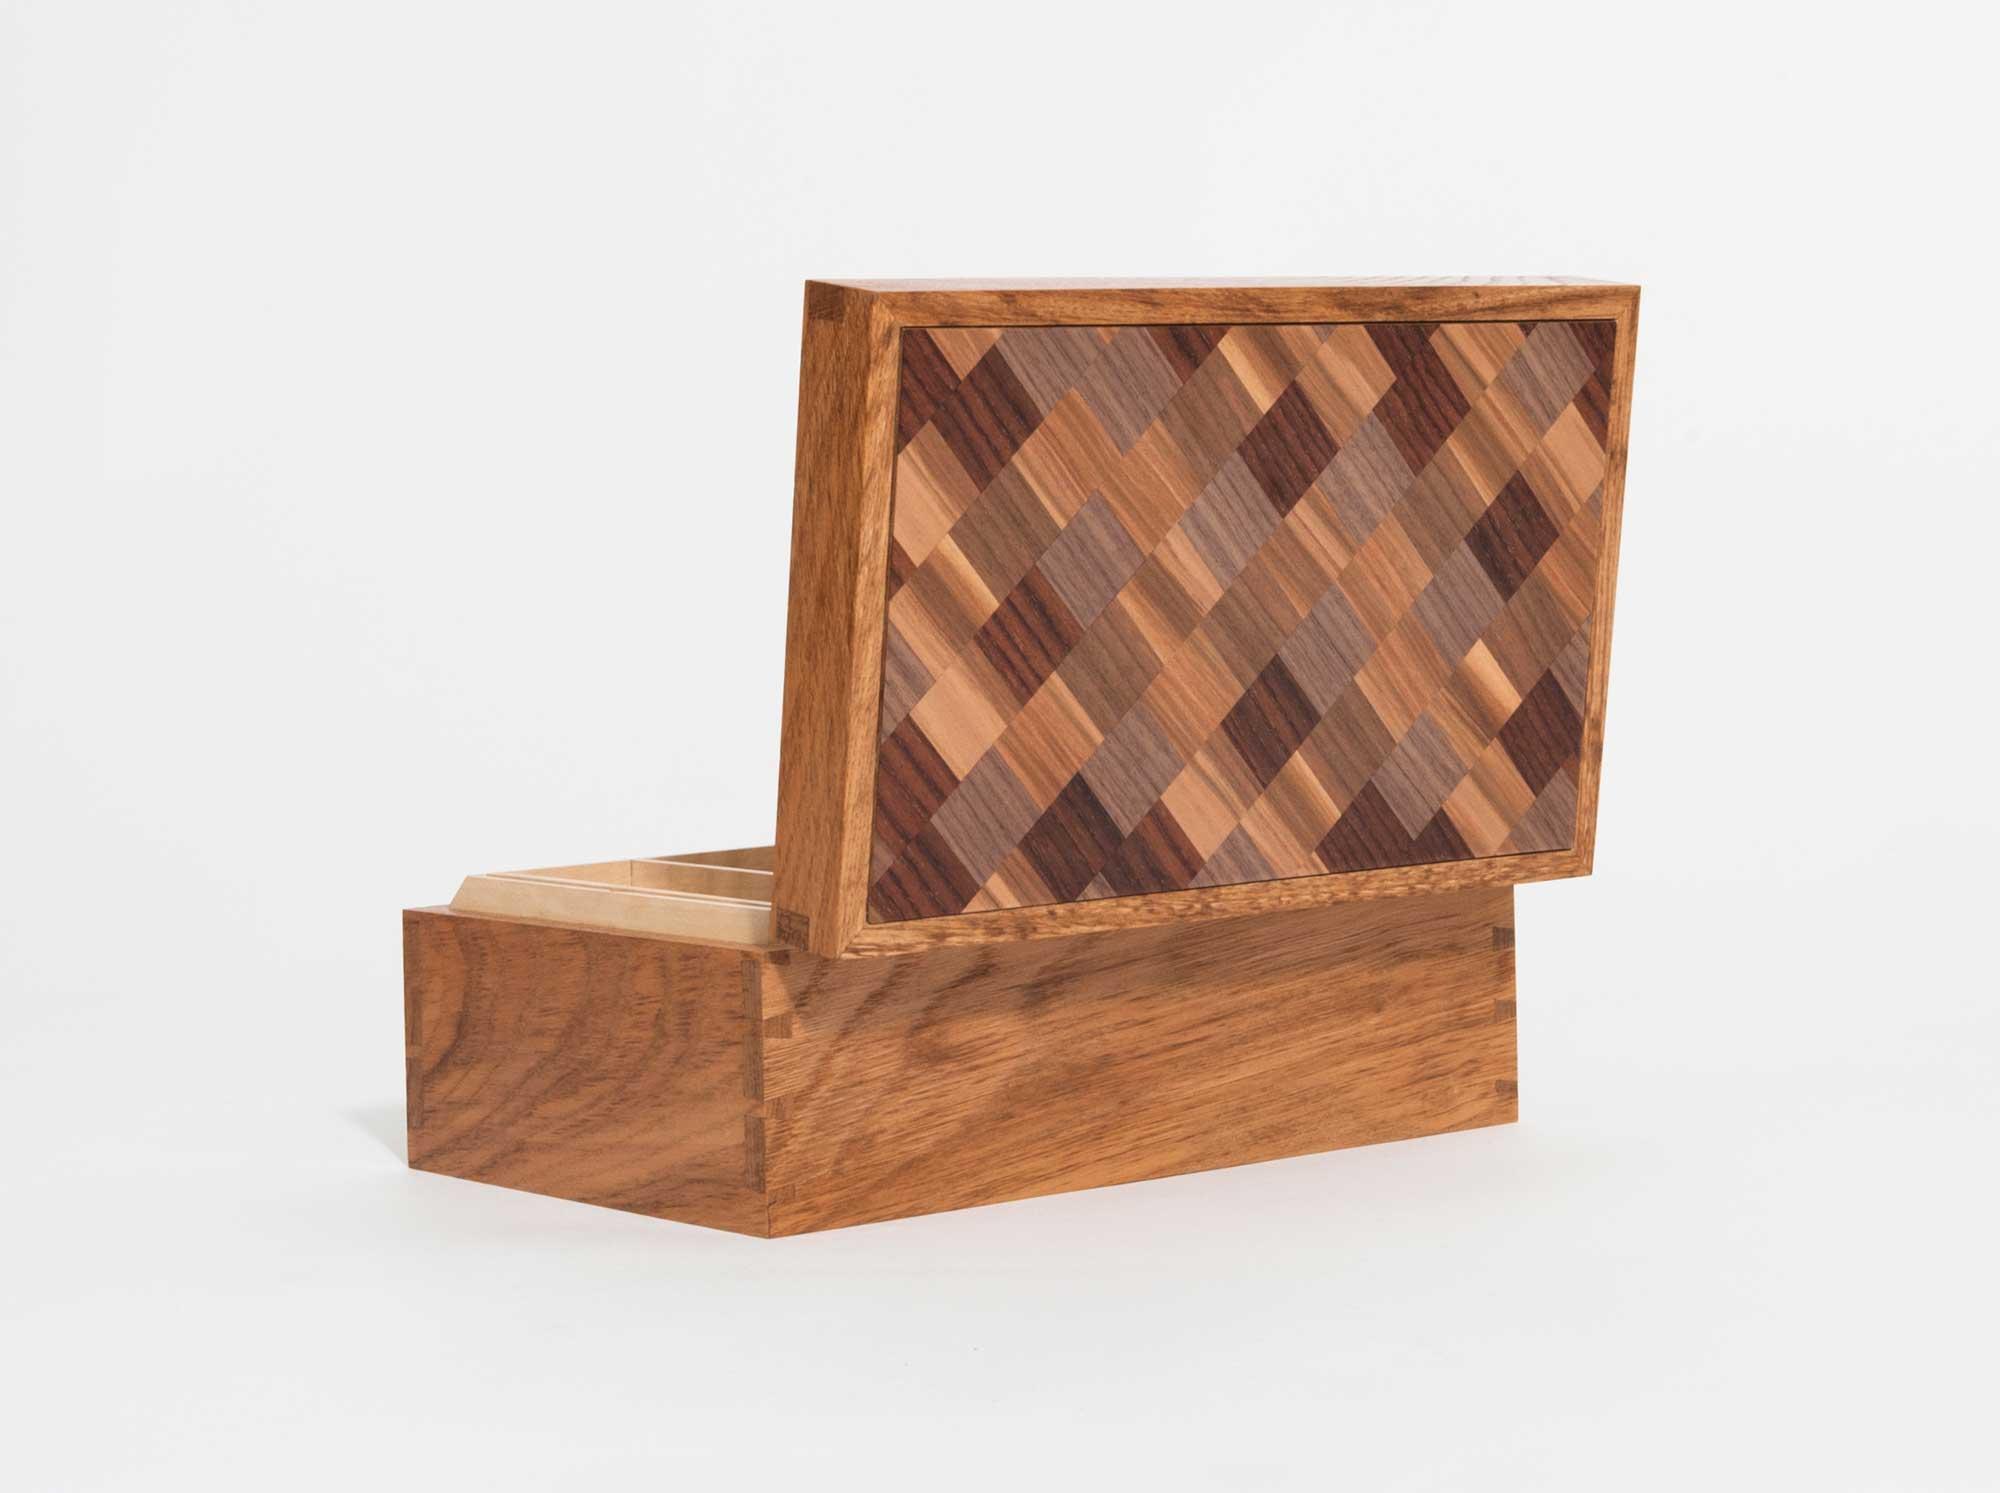 steve-coonick-box-2